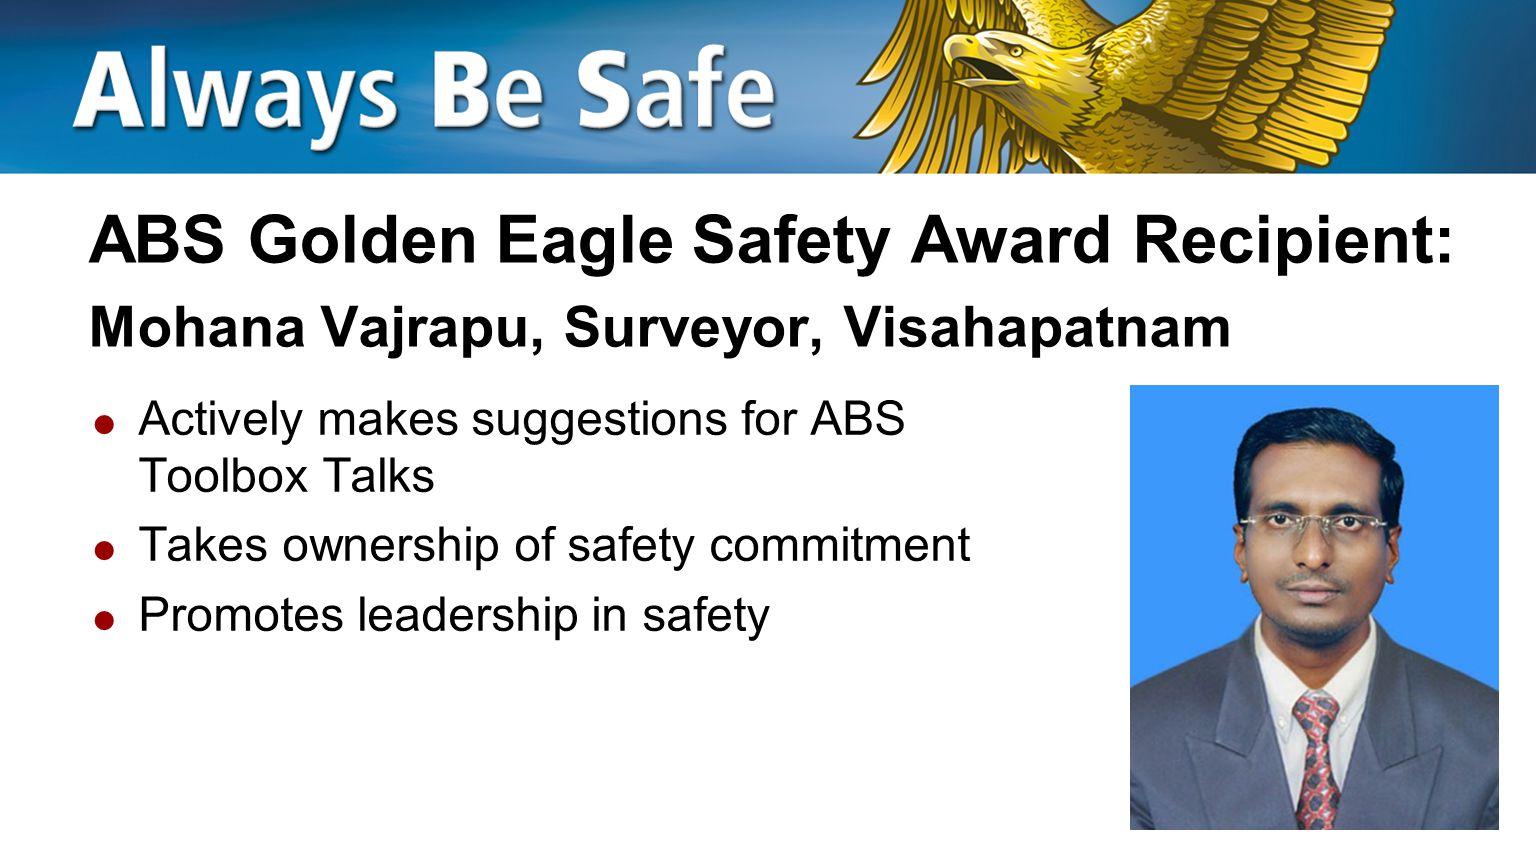 ABS Golden Eagle Safety Award Recipient: Mohana Vajrapu, Surveyor, Visahapatnam